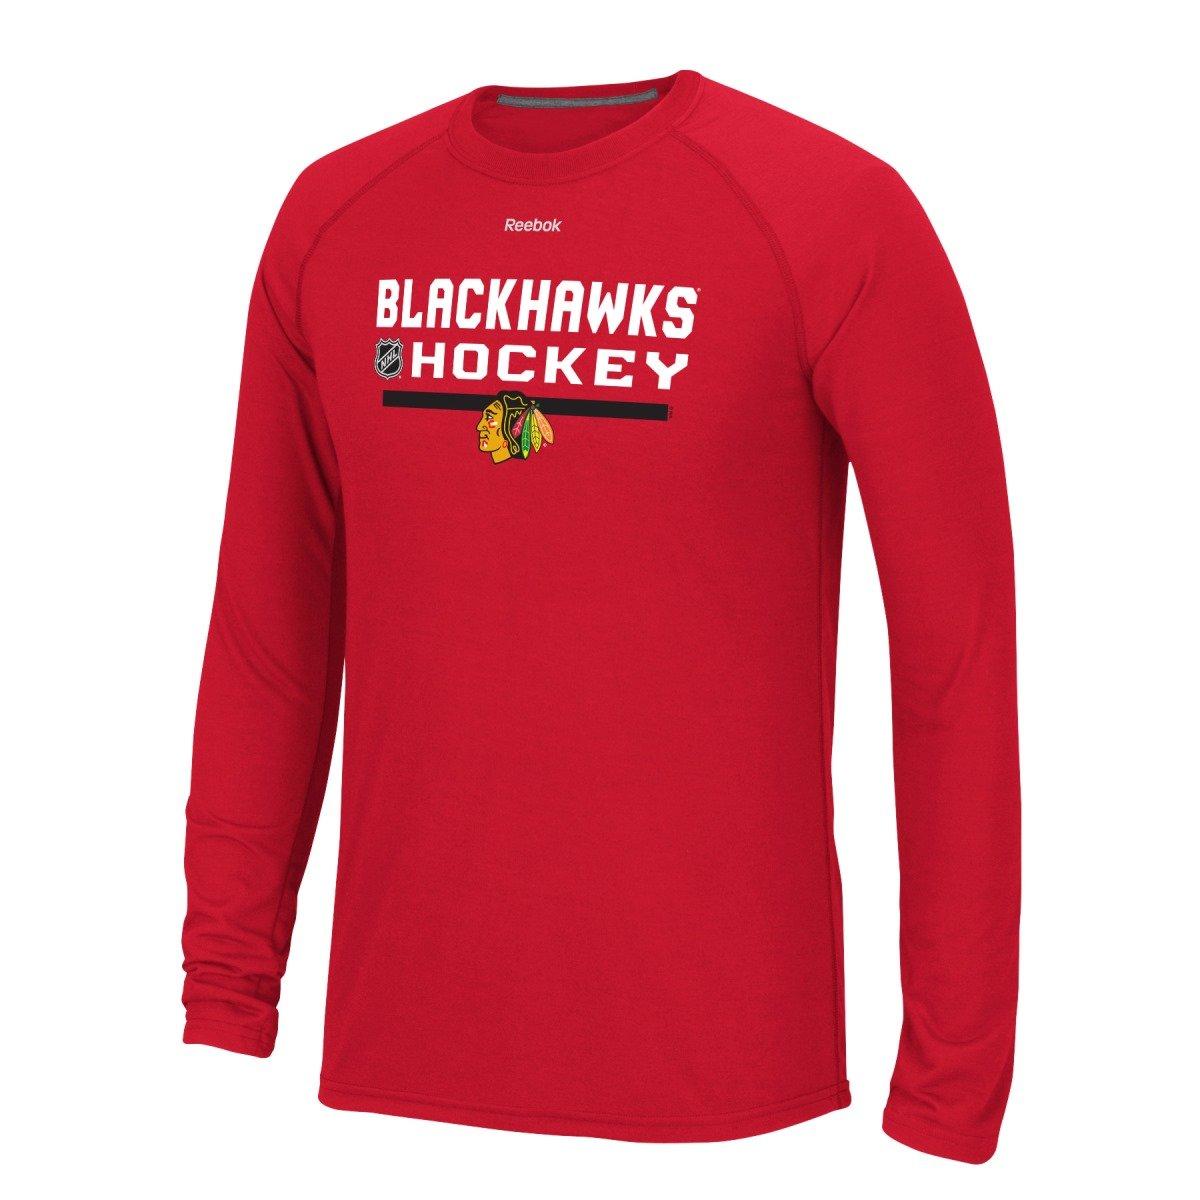 size 40 8eace 8233a Amazon.com   Reebok Chicago Blackhawks NHL Center Ice 2015 Locker Room L S  Men s T-Shirt   Clothing